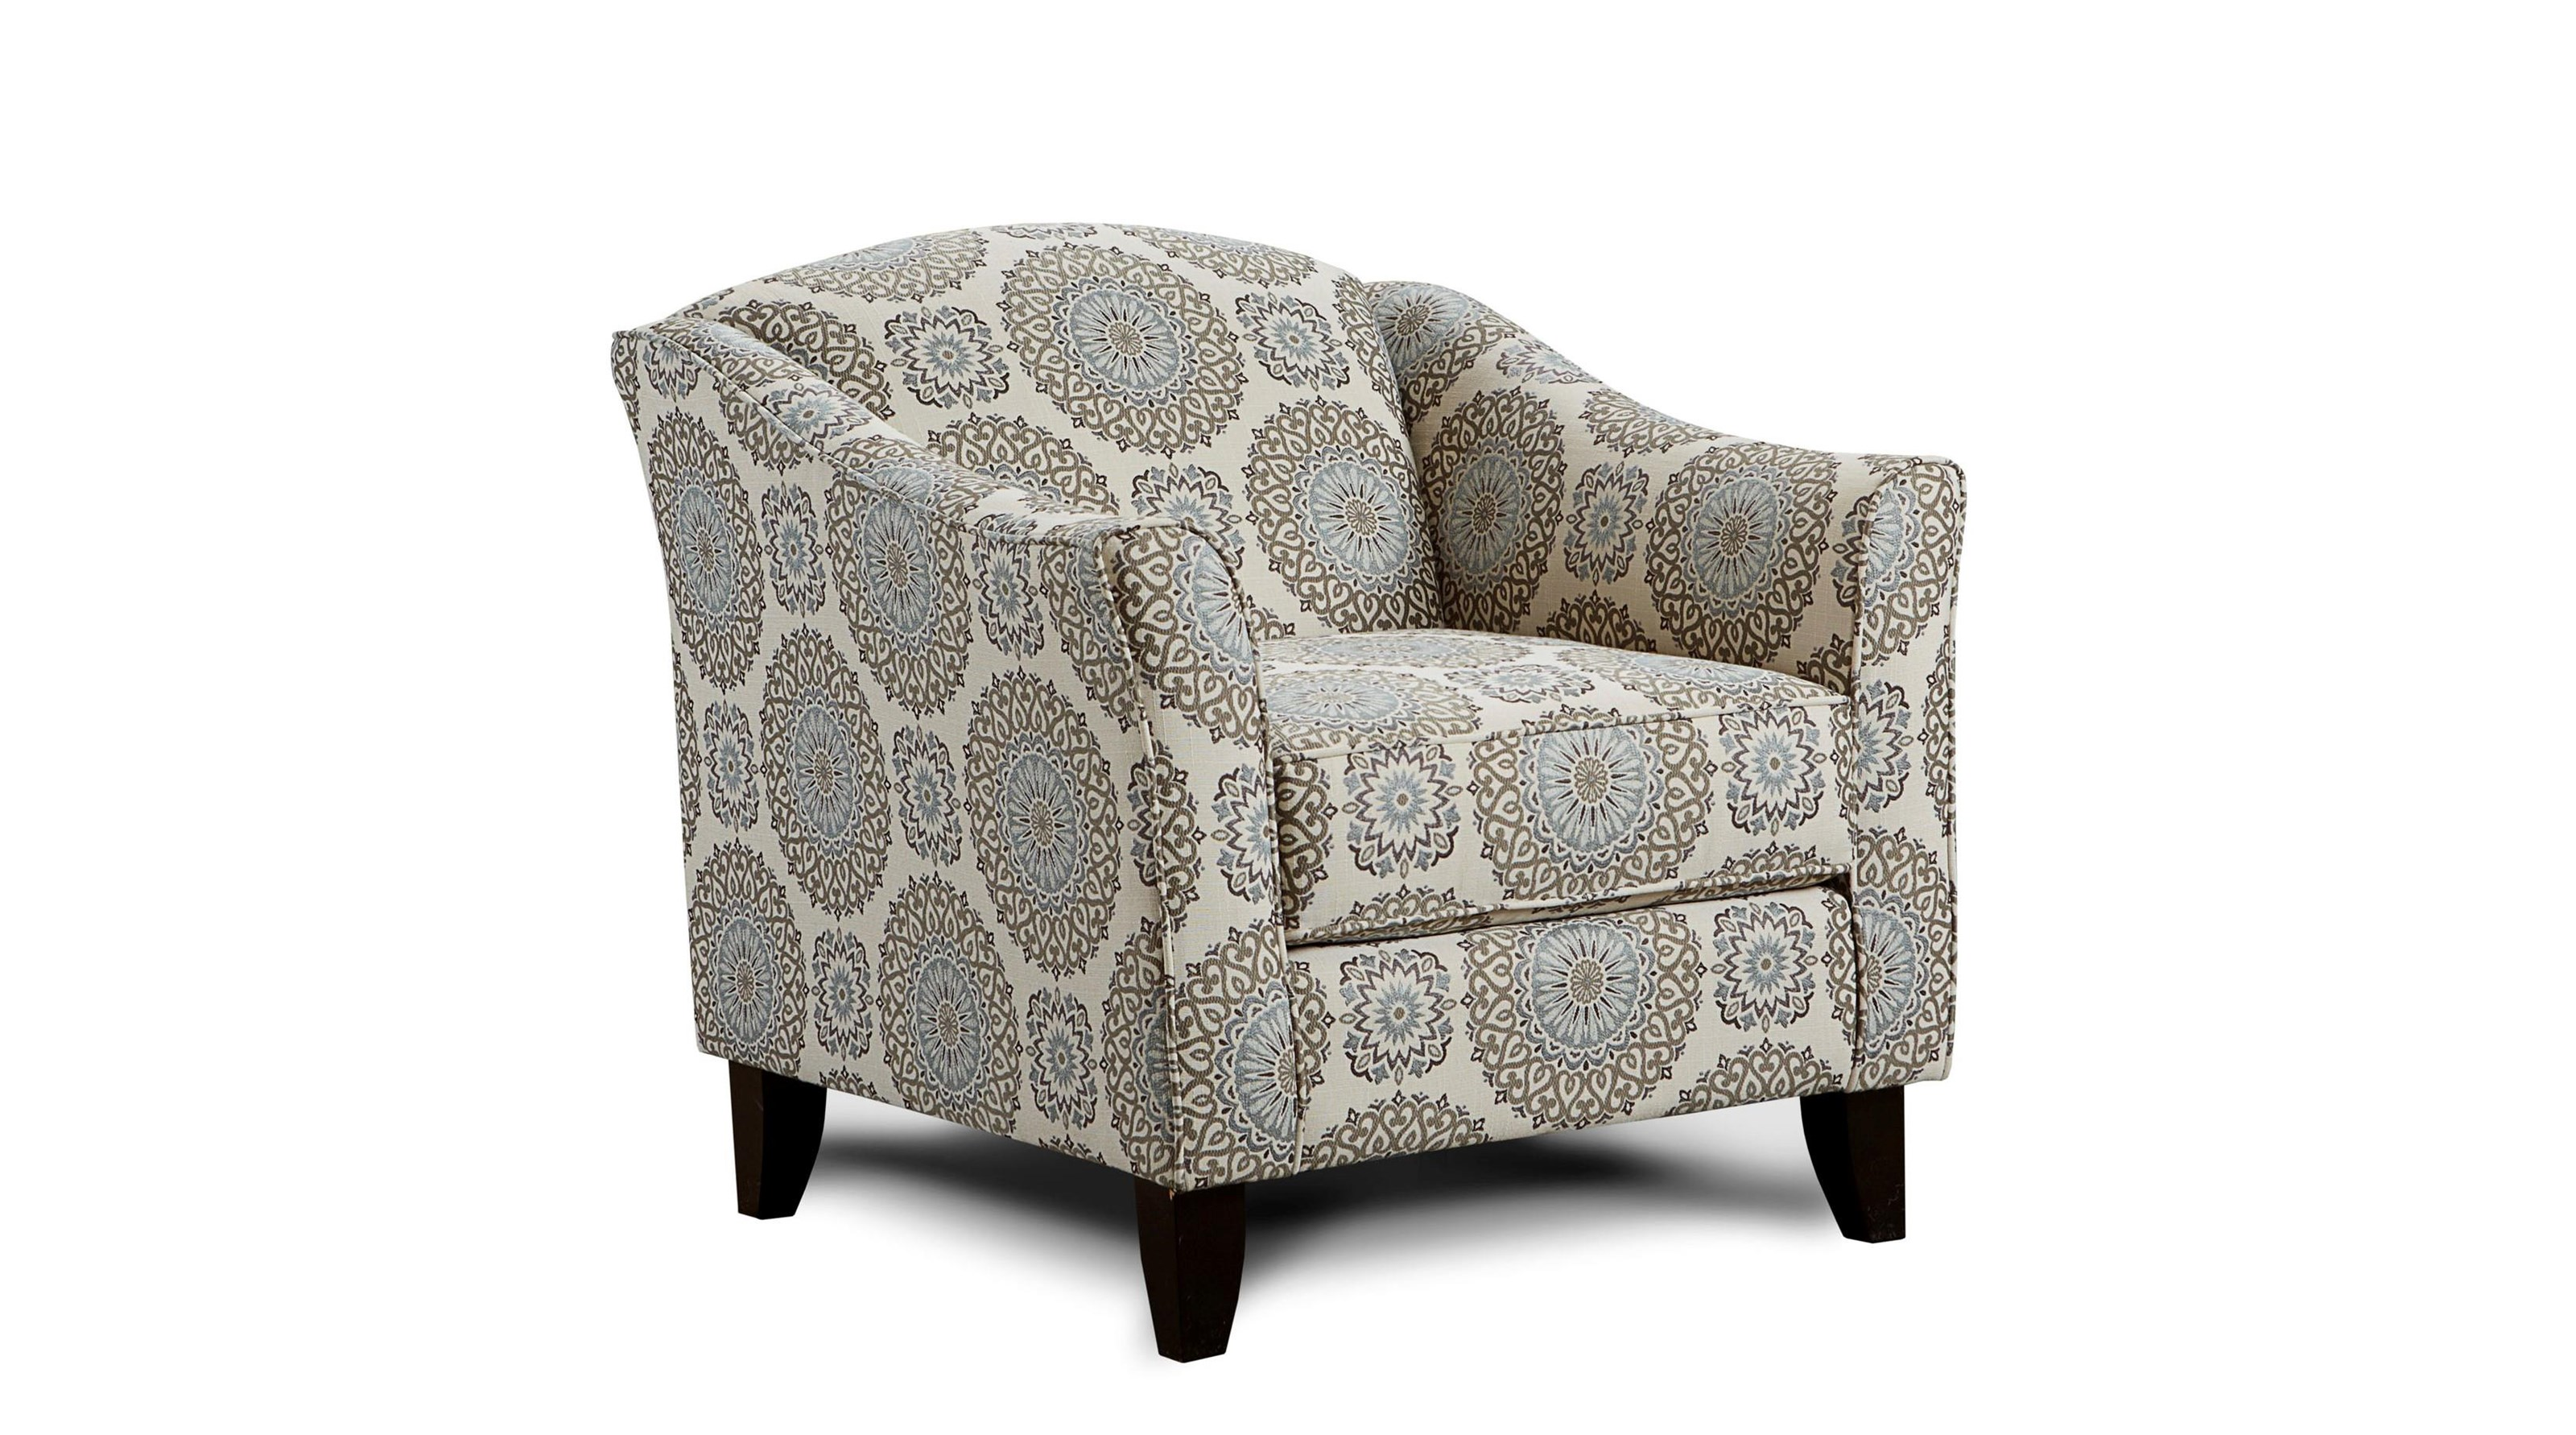 Fusion Furniture Grande Mist Brianne Twilight Accent Chair - Item Number: 452 BRIANNE-TWILIGHT